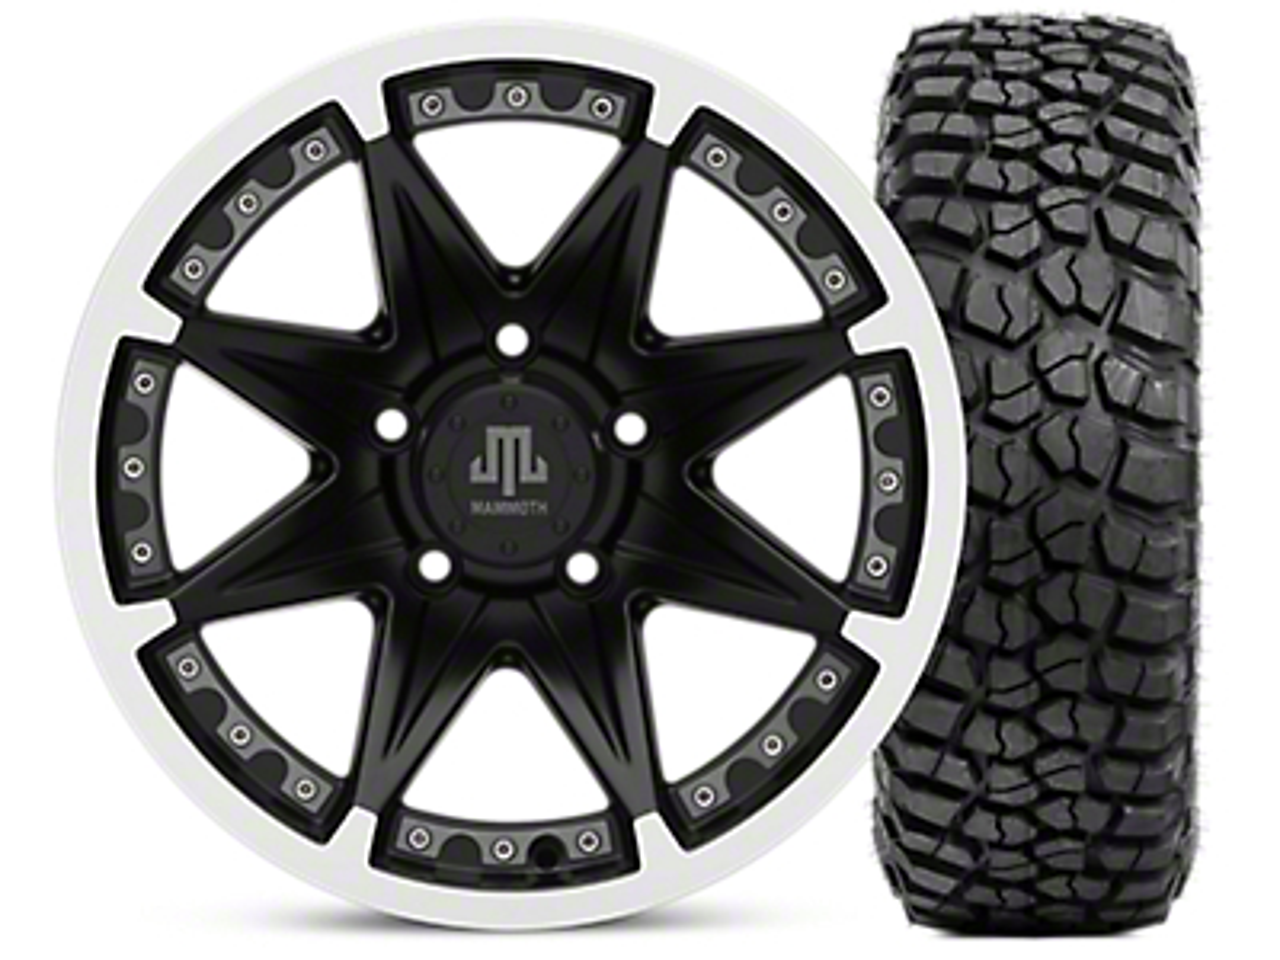 Mammoth Type 88 Wheel - Matte Black Wheel - 16x8 Wheel - & BFG KM2 Tire 315/75- 16 (07-18 Jeep Wrangler JK; 2018 Jeep Wrangler JL)